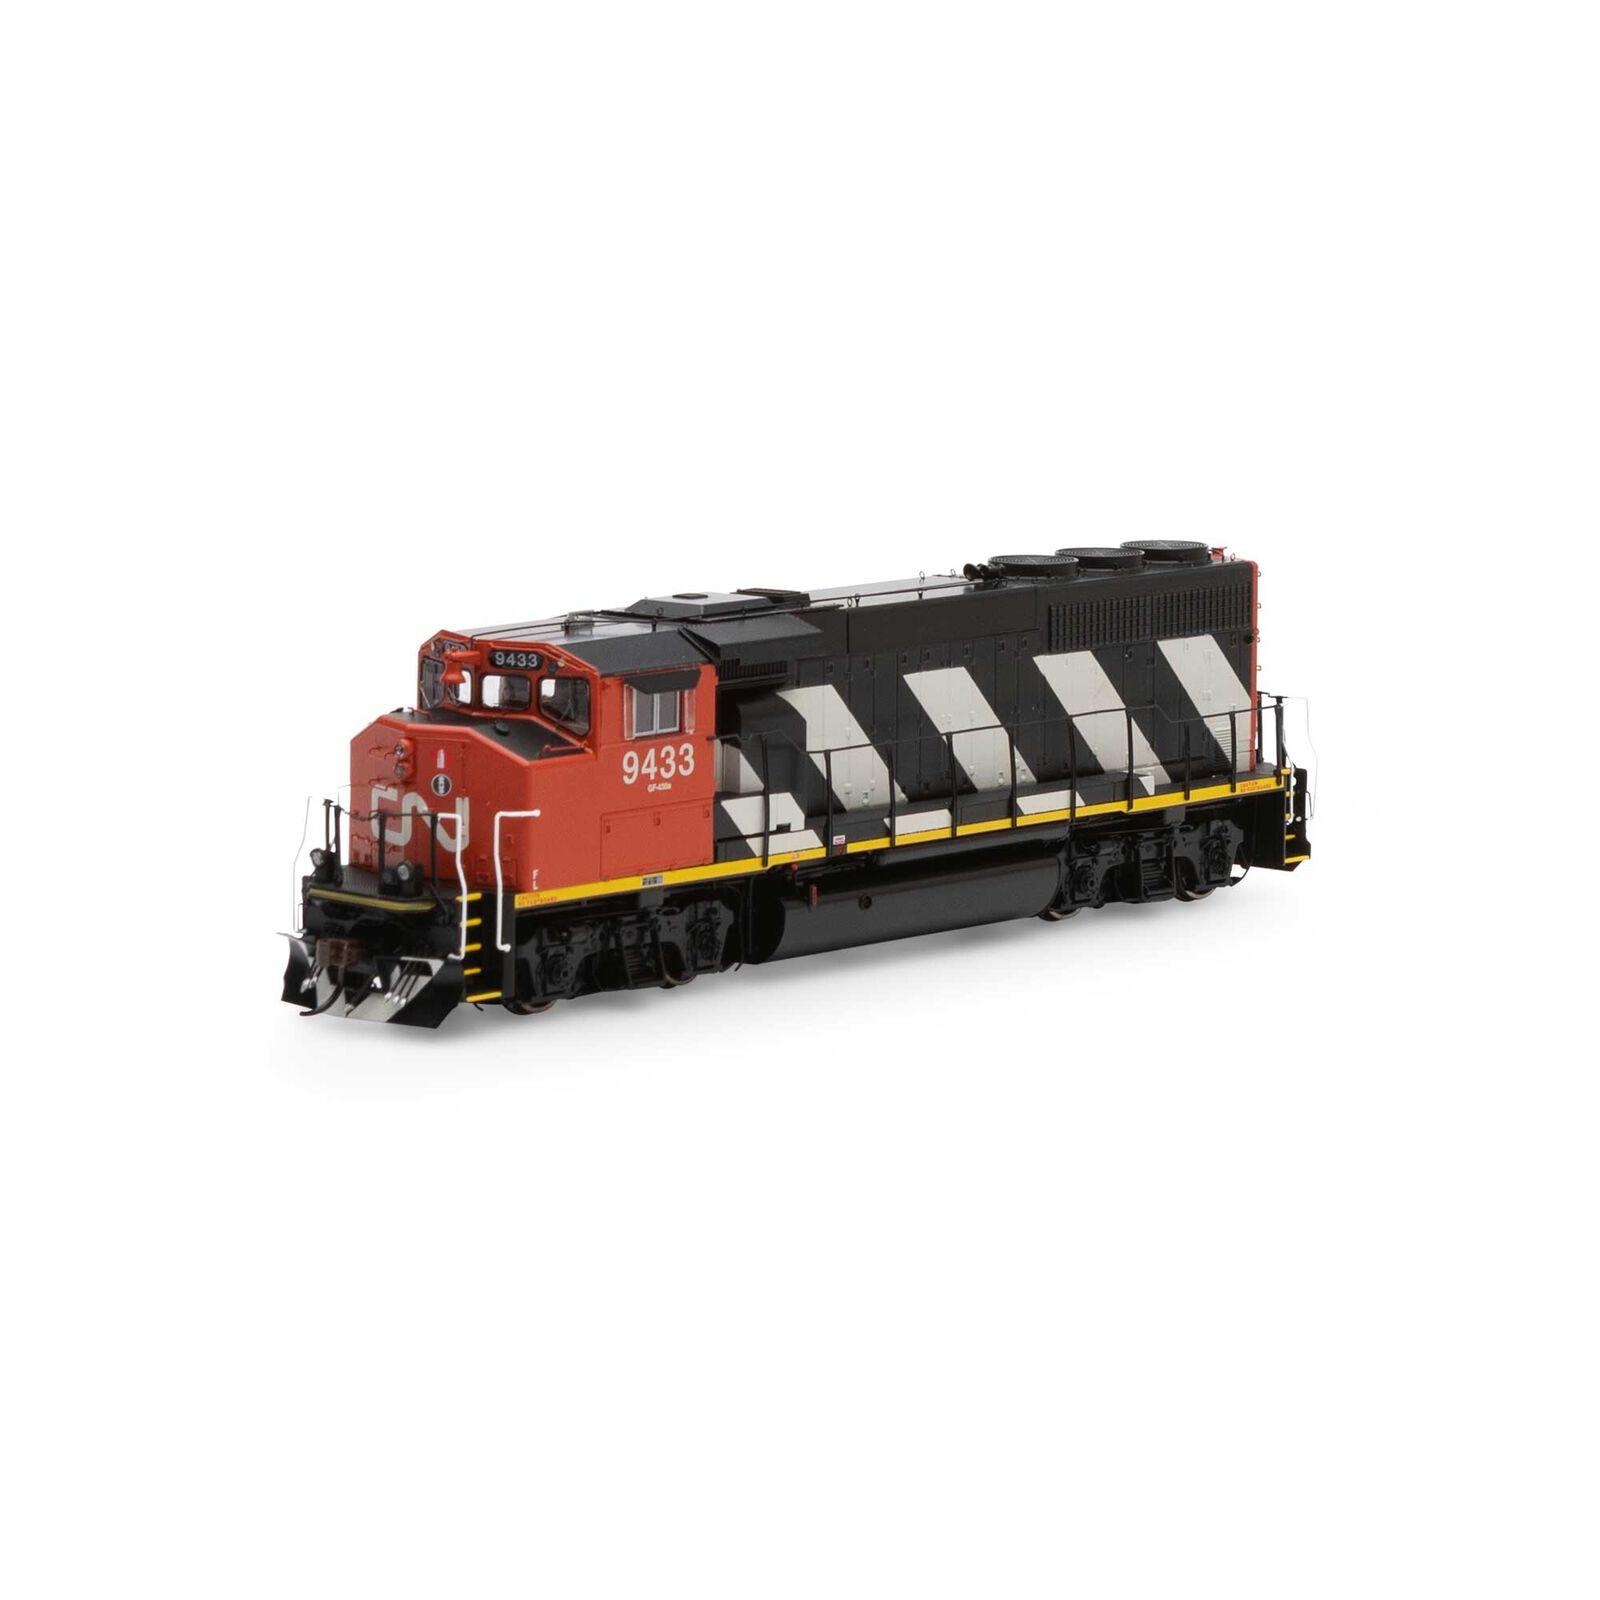 HO GP40-2L with DCC & Sound, CN #9433